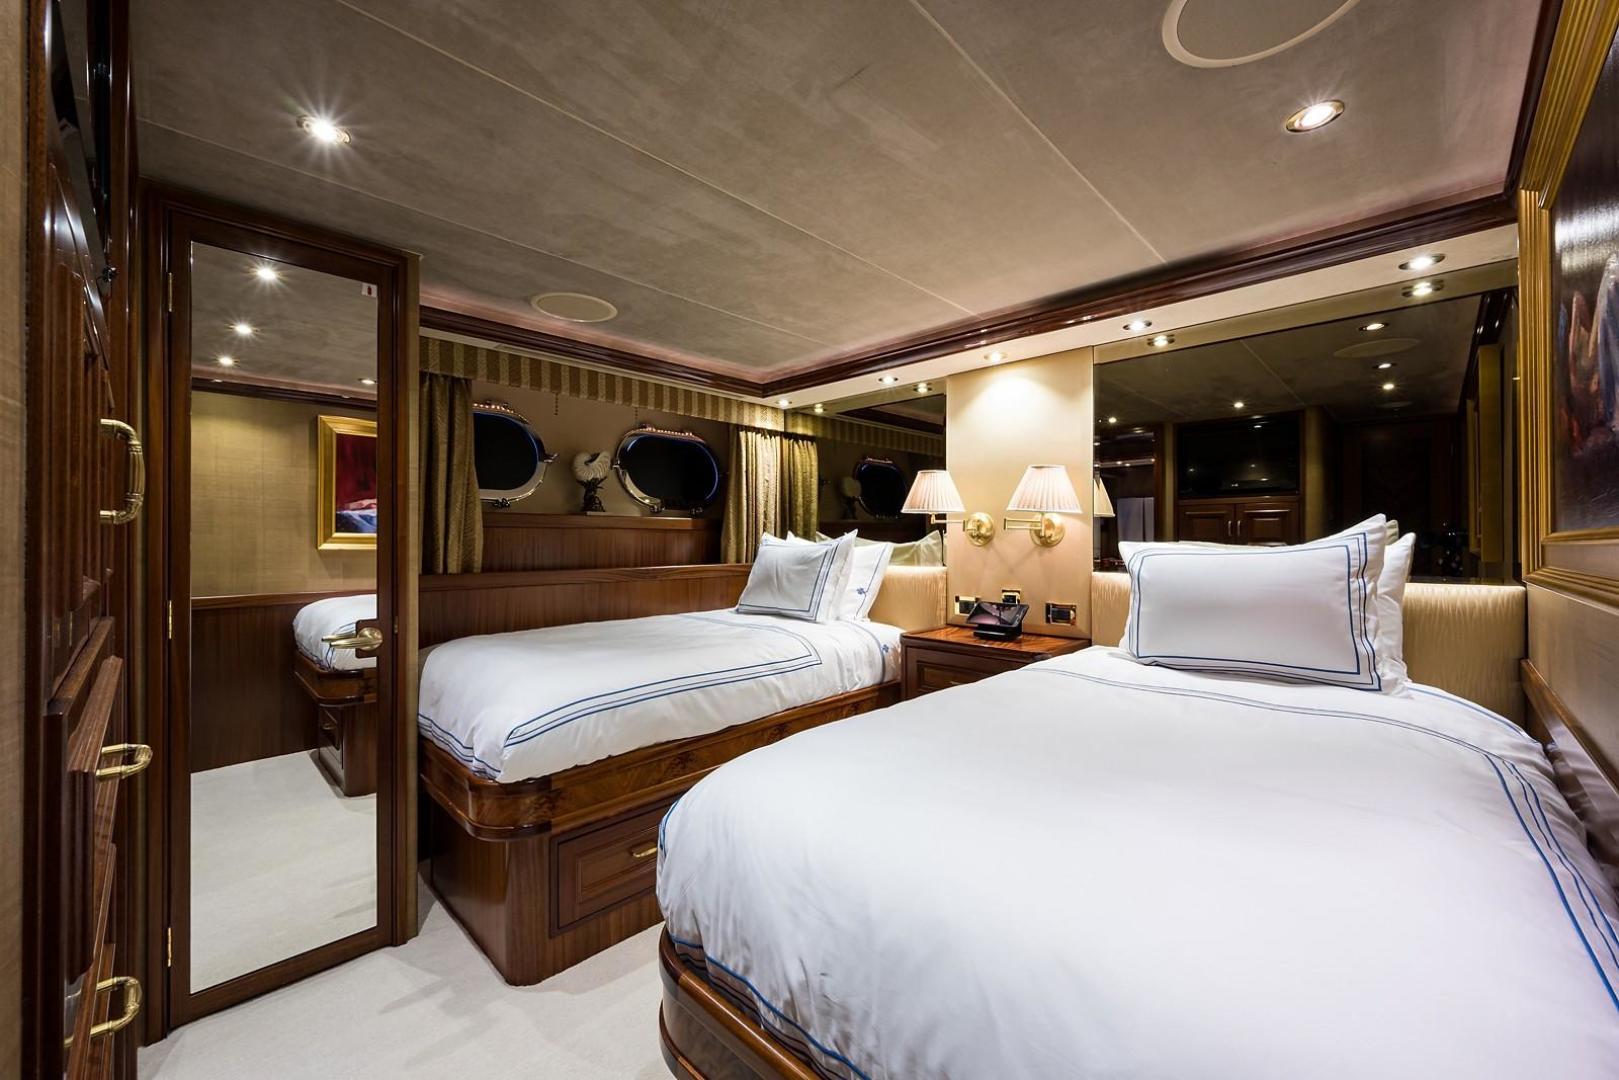 Westport-Motoryacht 2010-Cavallino Fort Lauderdale-Florida-United States-Guest Stateroom/Twin-1270105 | Thumbnail